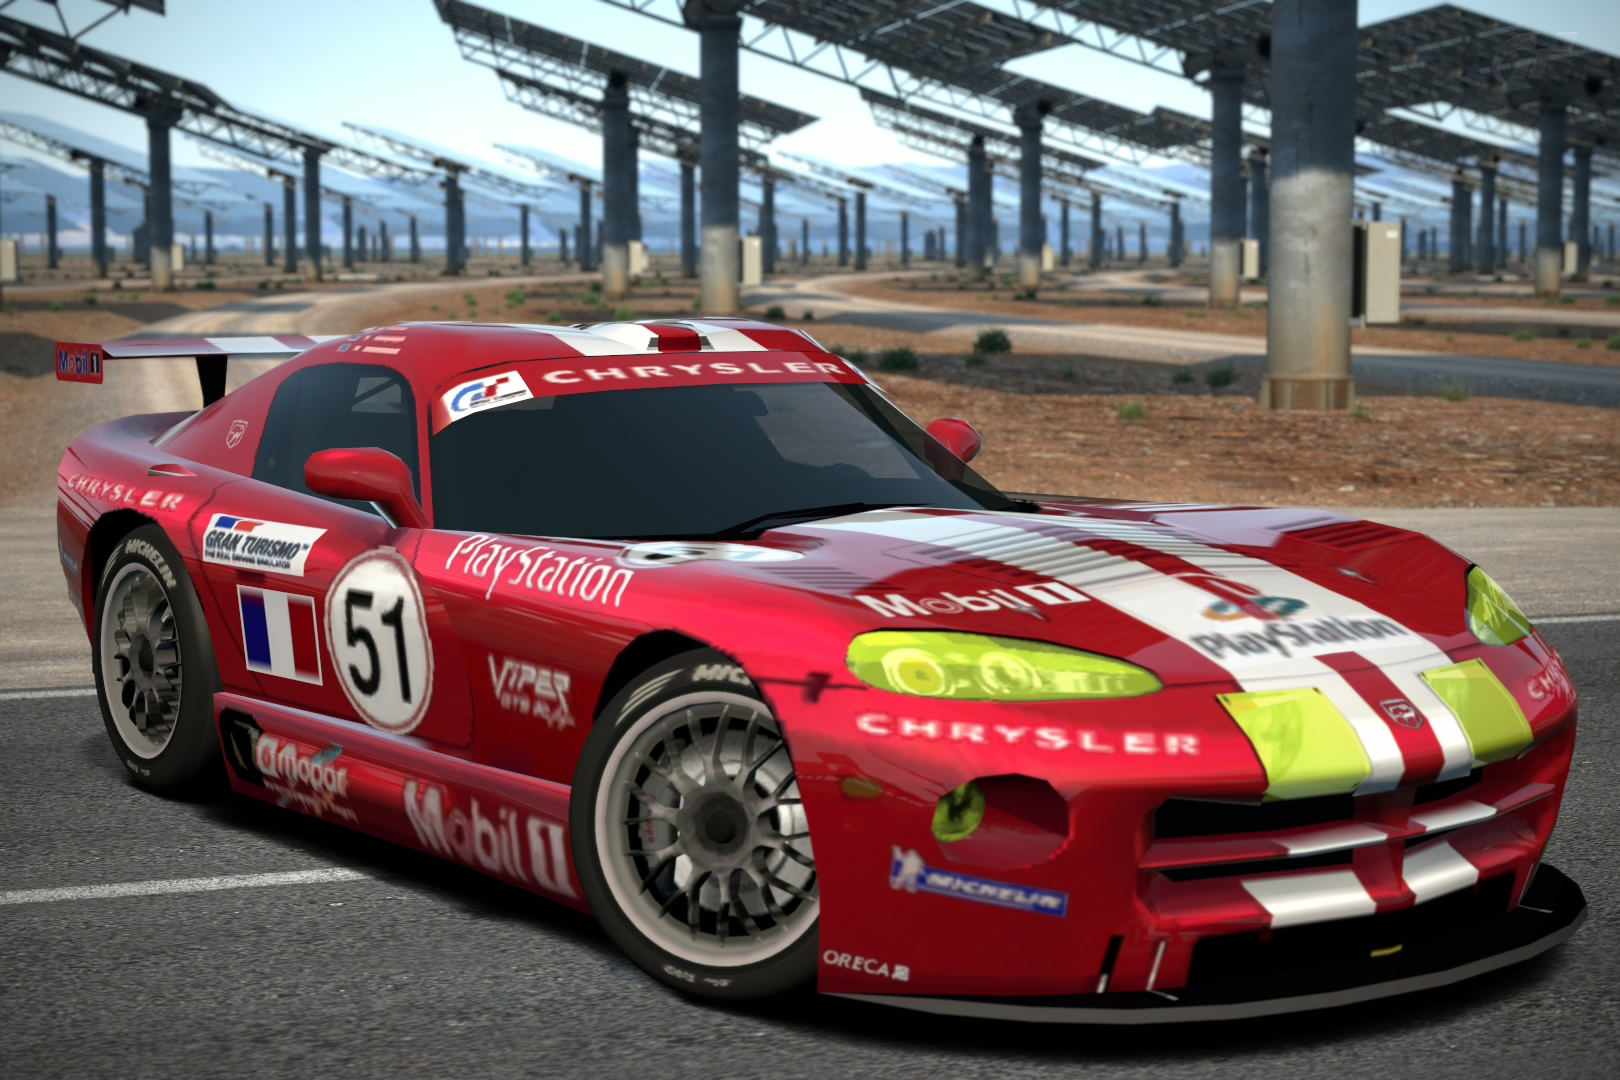 Dodge Viper GTS-R | Gran Turismo Wiki | FANDOM powered by Wikia